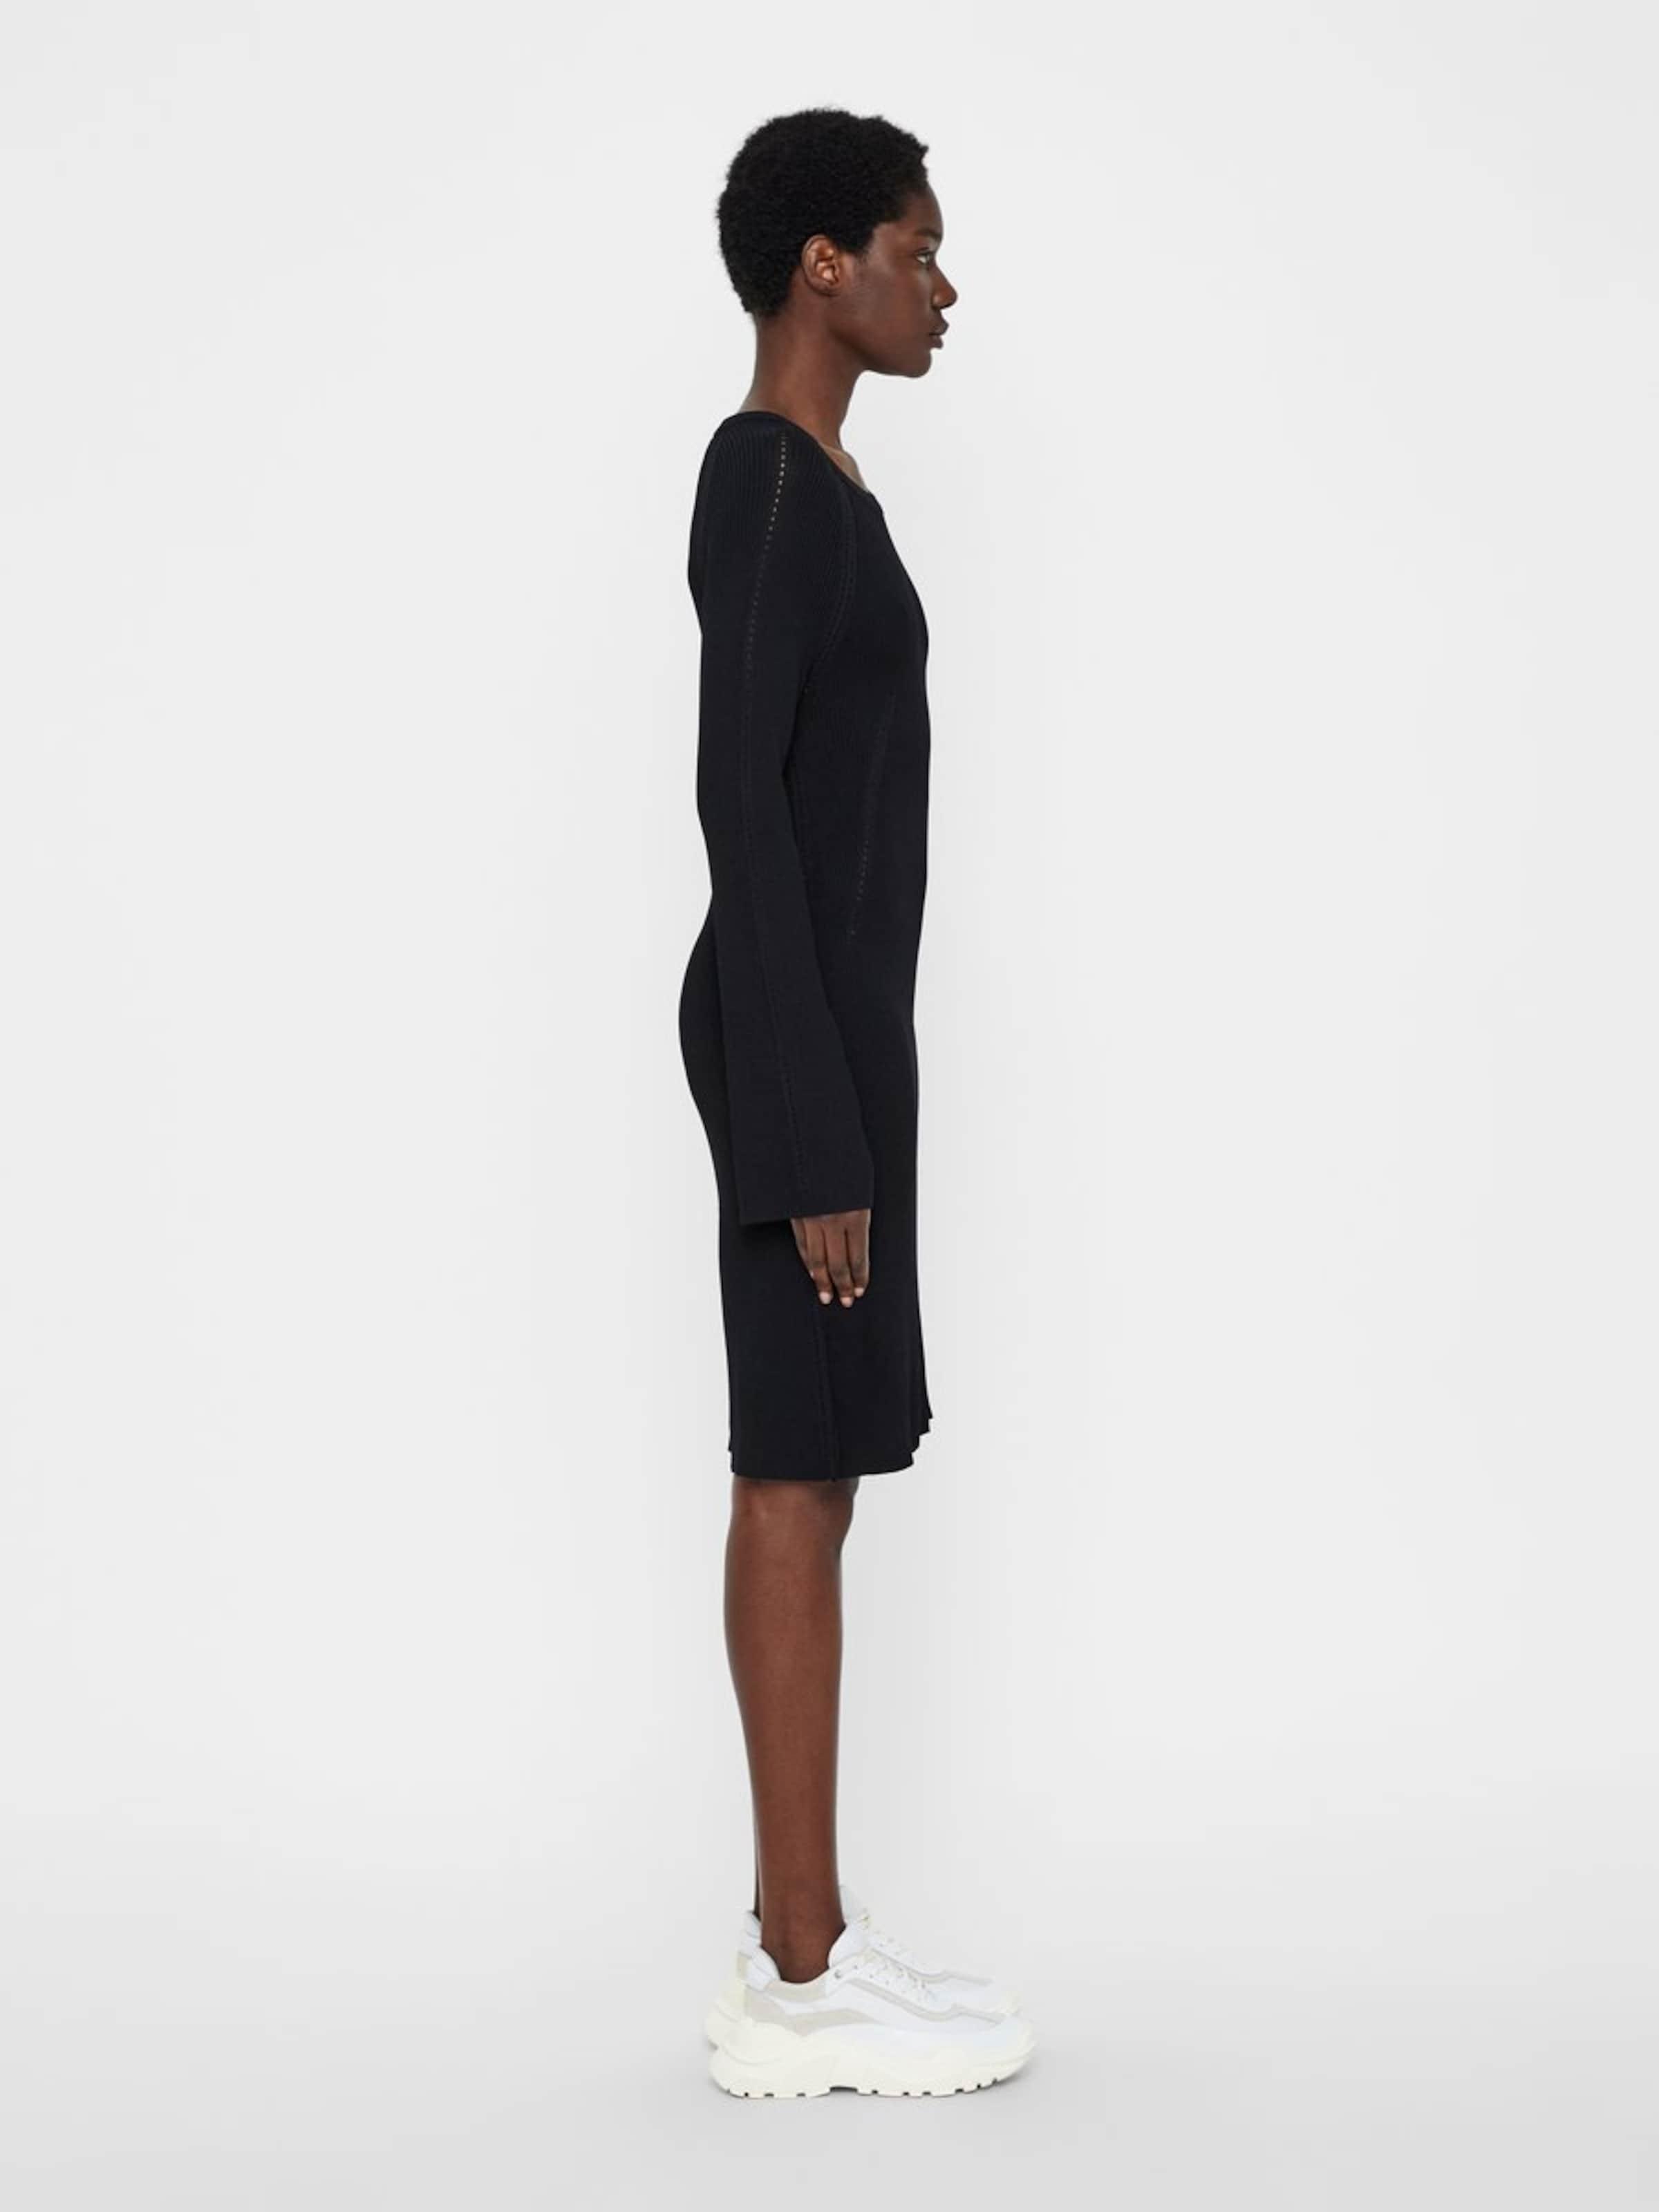 Robe Noir 'melina' J En lindeberg Ow80mvNn